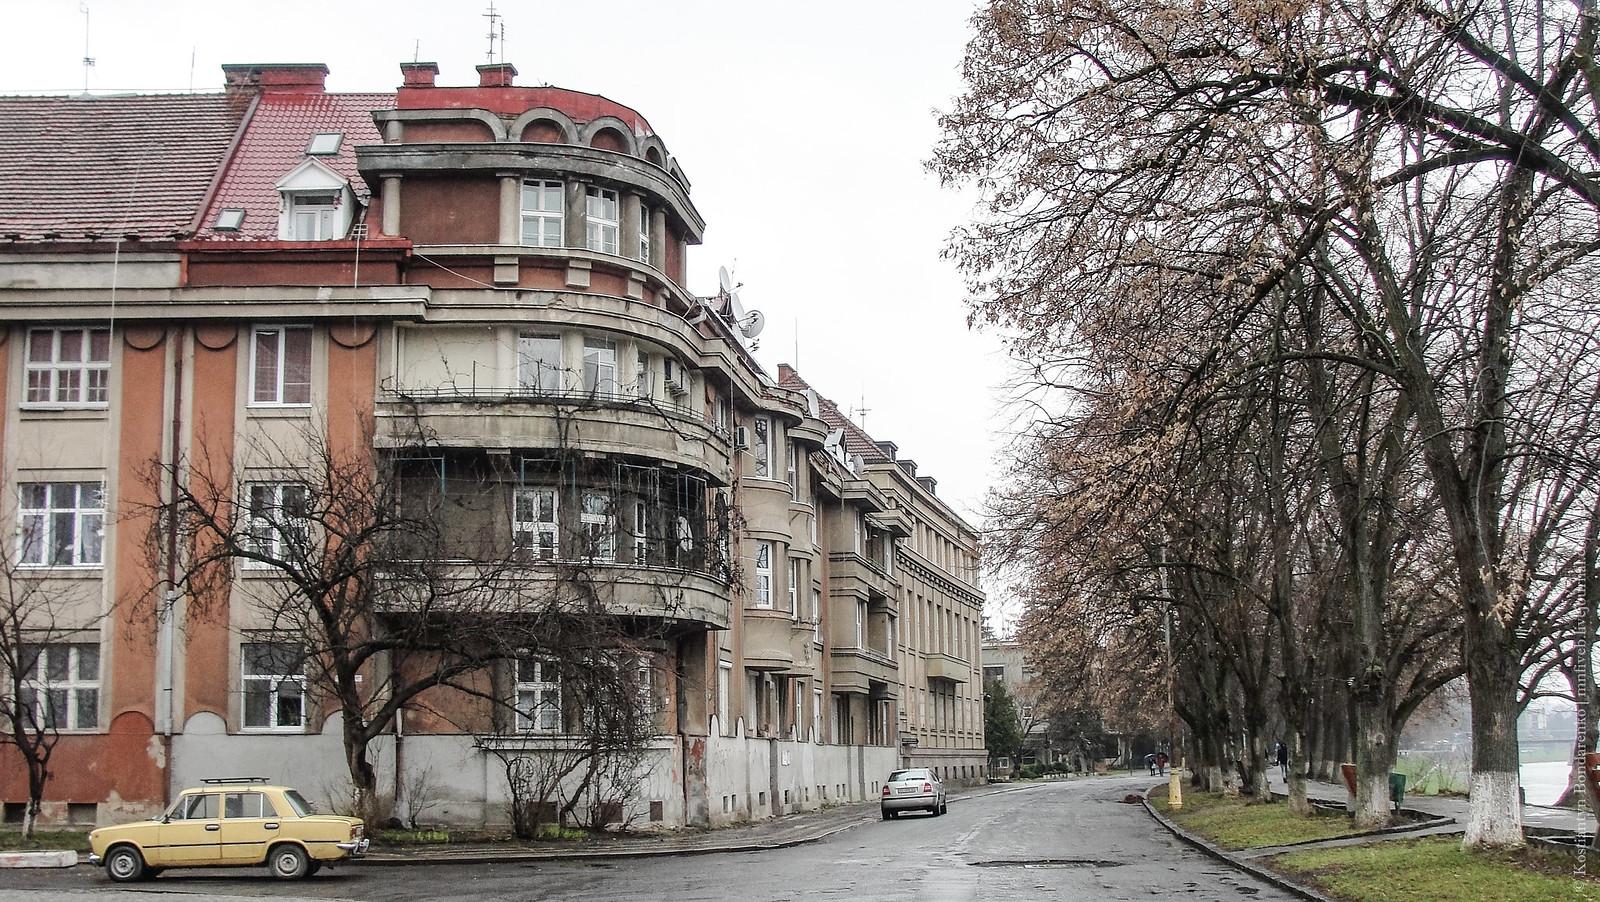 20170318 - Uzhgorod-25